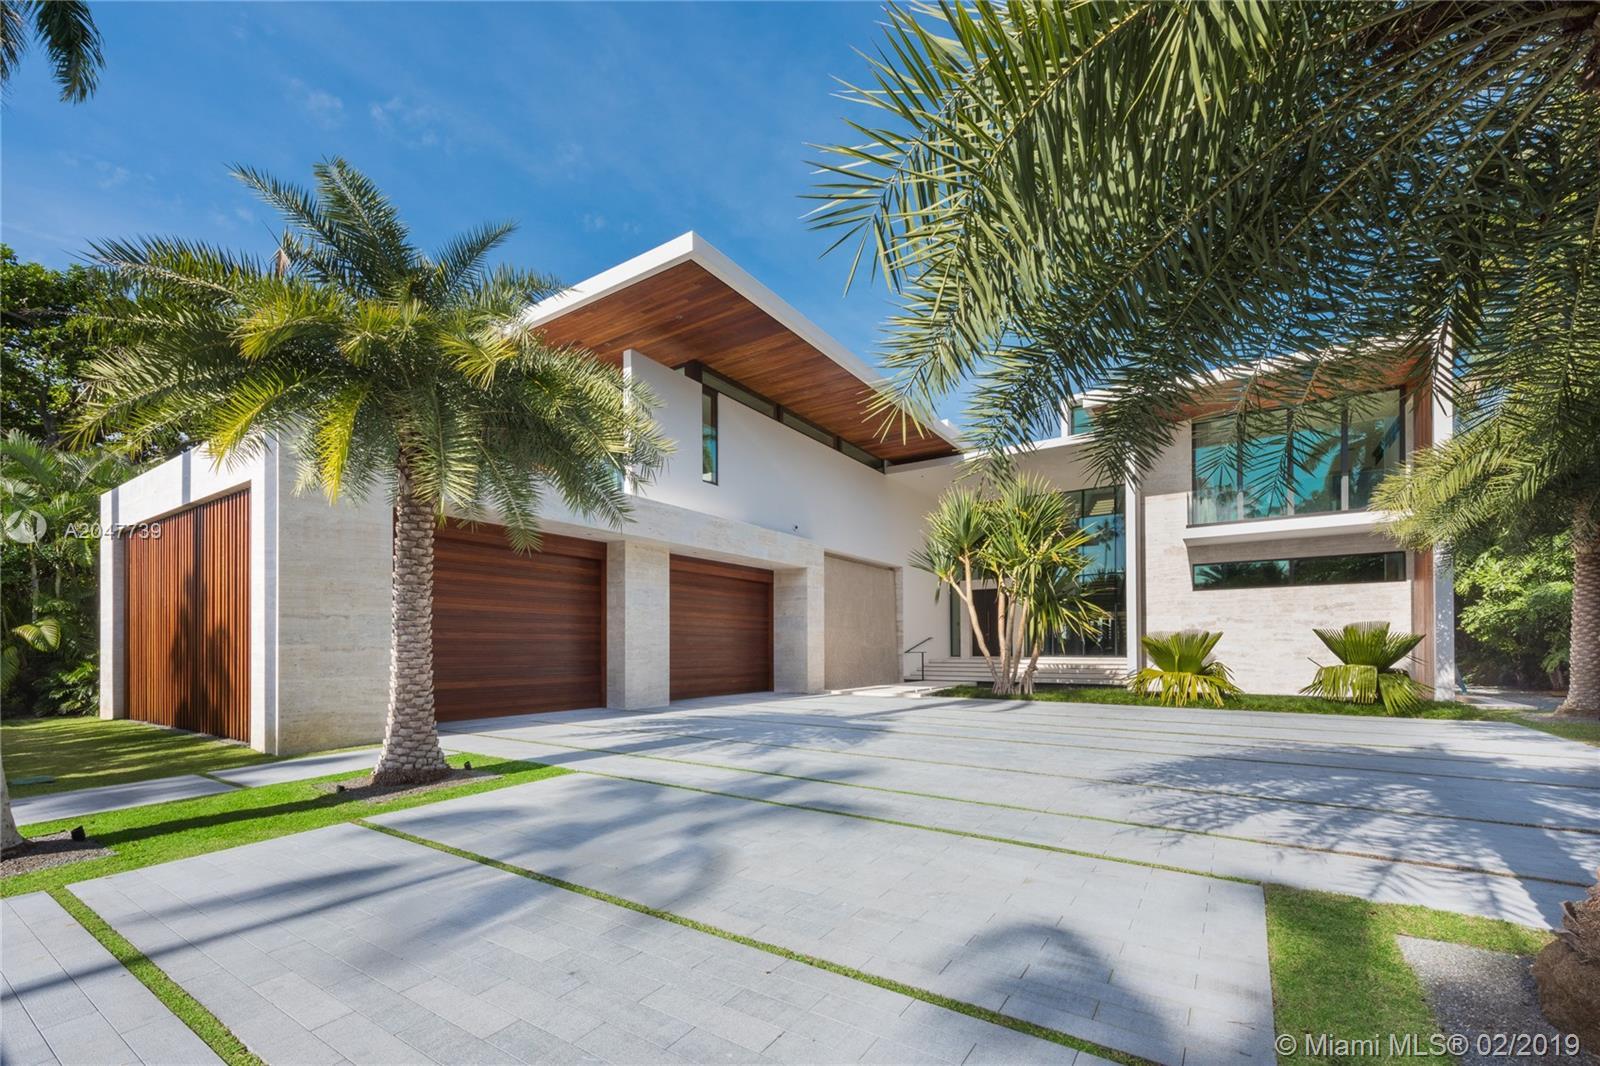 73 Palm av- miami-beach-fl-33139-a2047739-Pic01